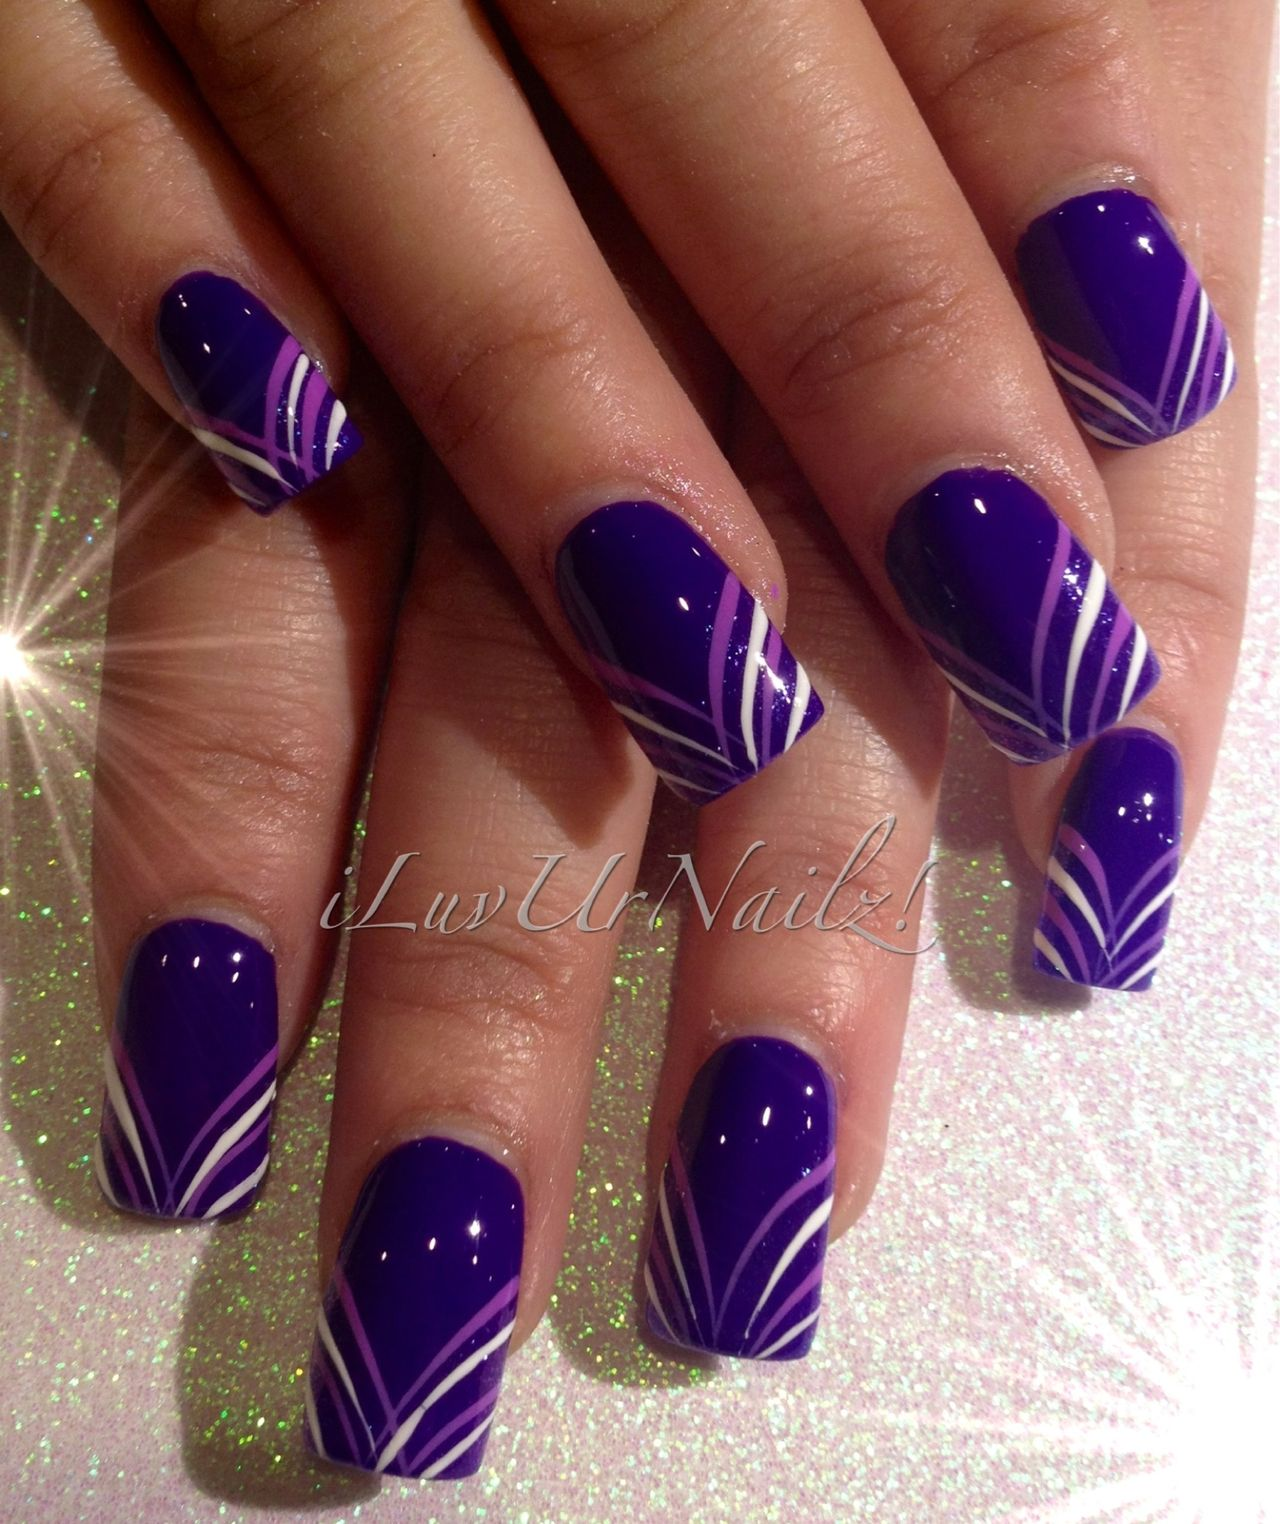 Pin By Letta N Rich Tackett On Nails Purple Nail Art Designs Purple Nail Art Nail Designs